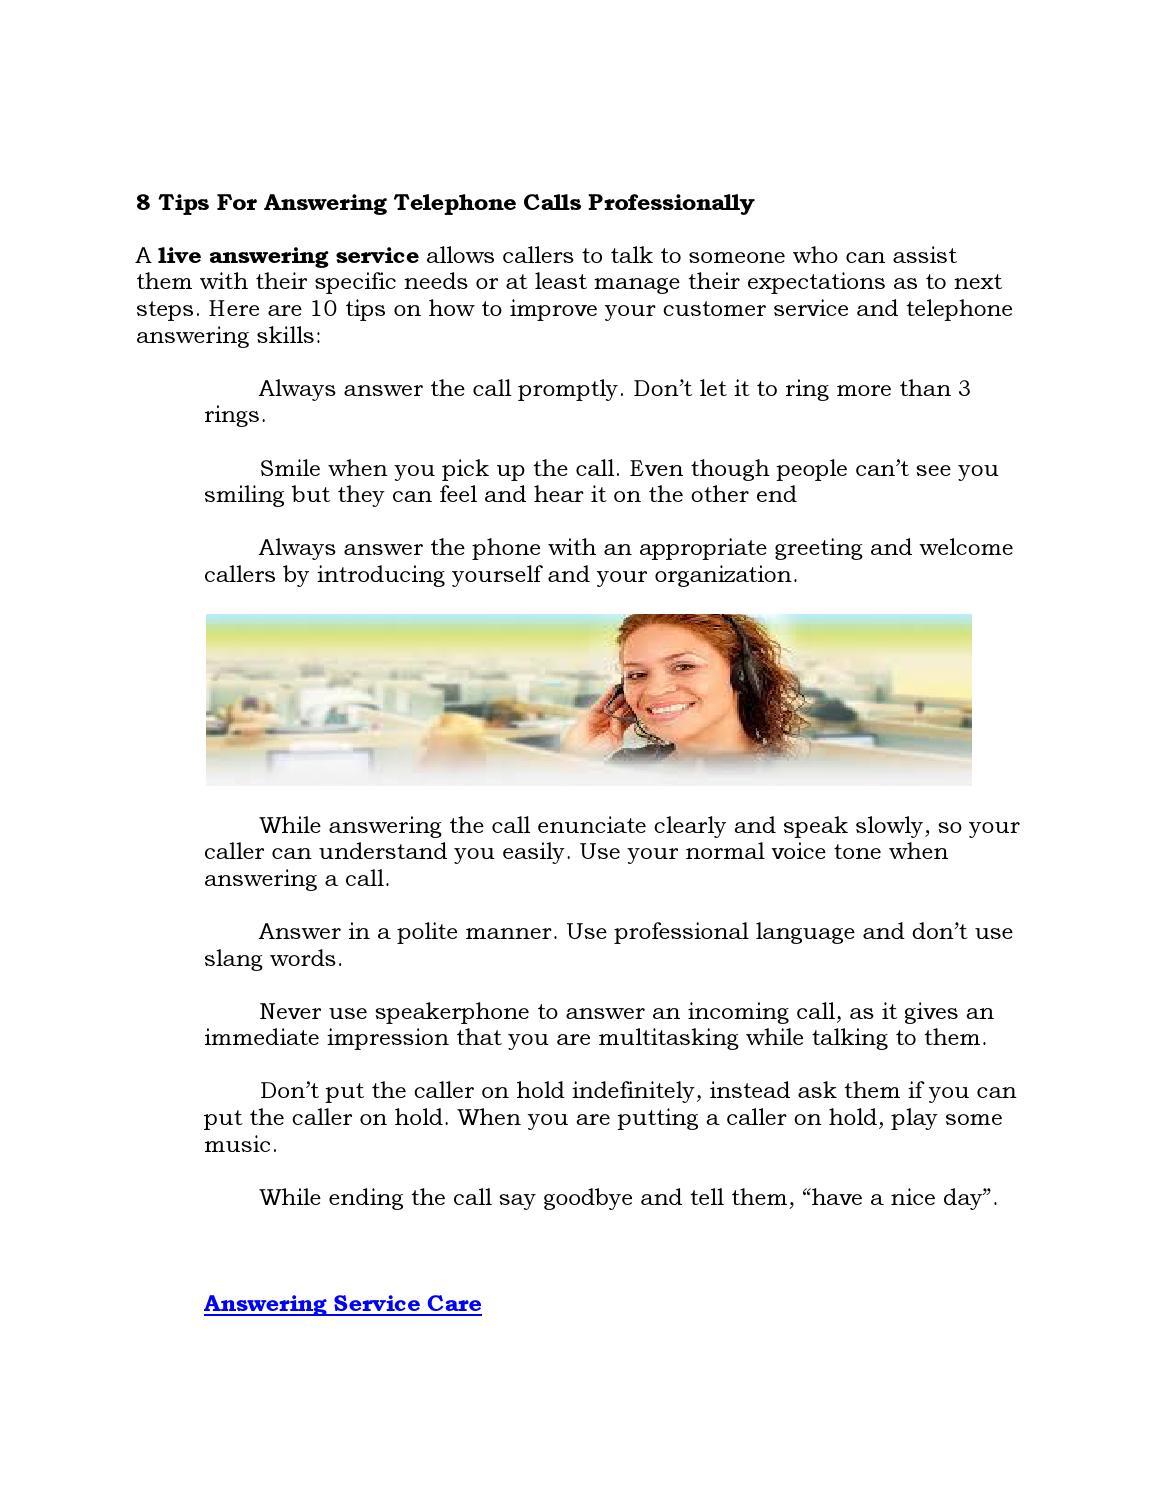 How to speak: rings or calls